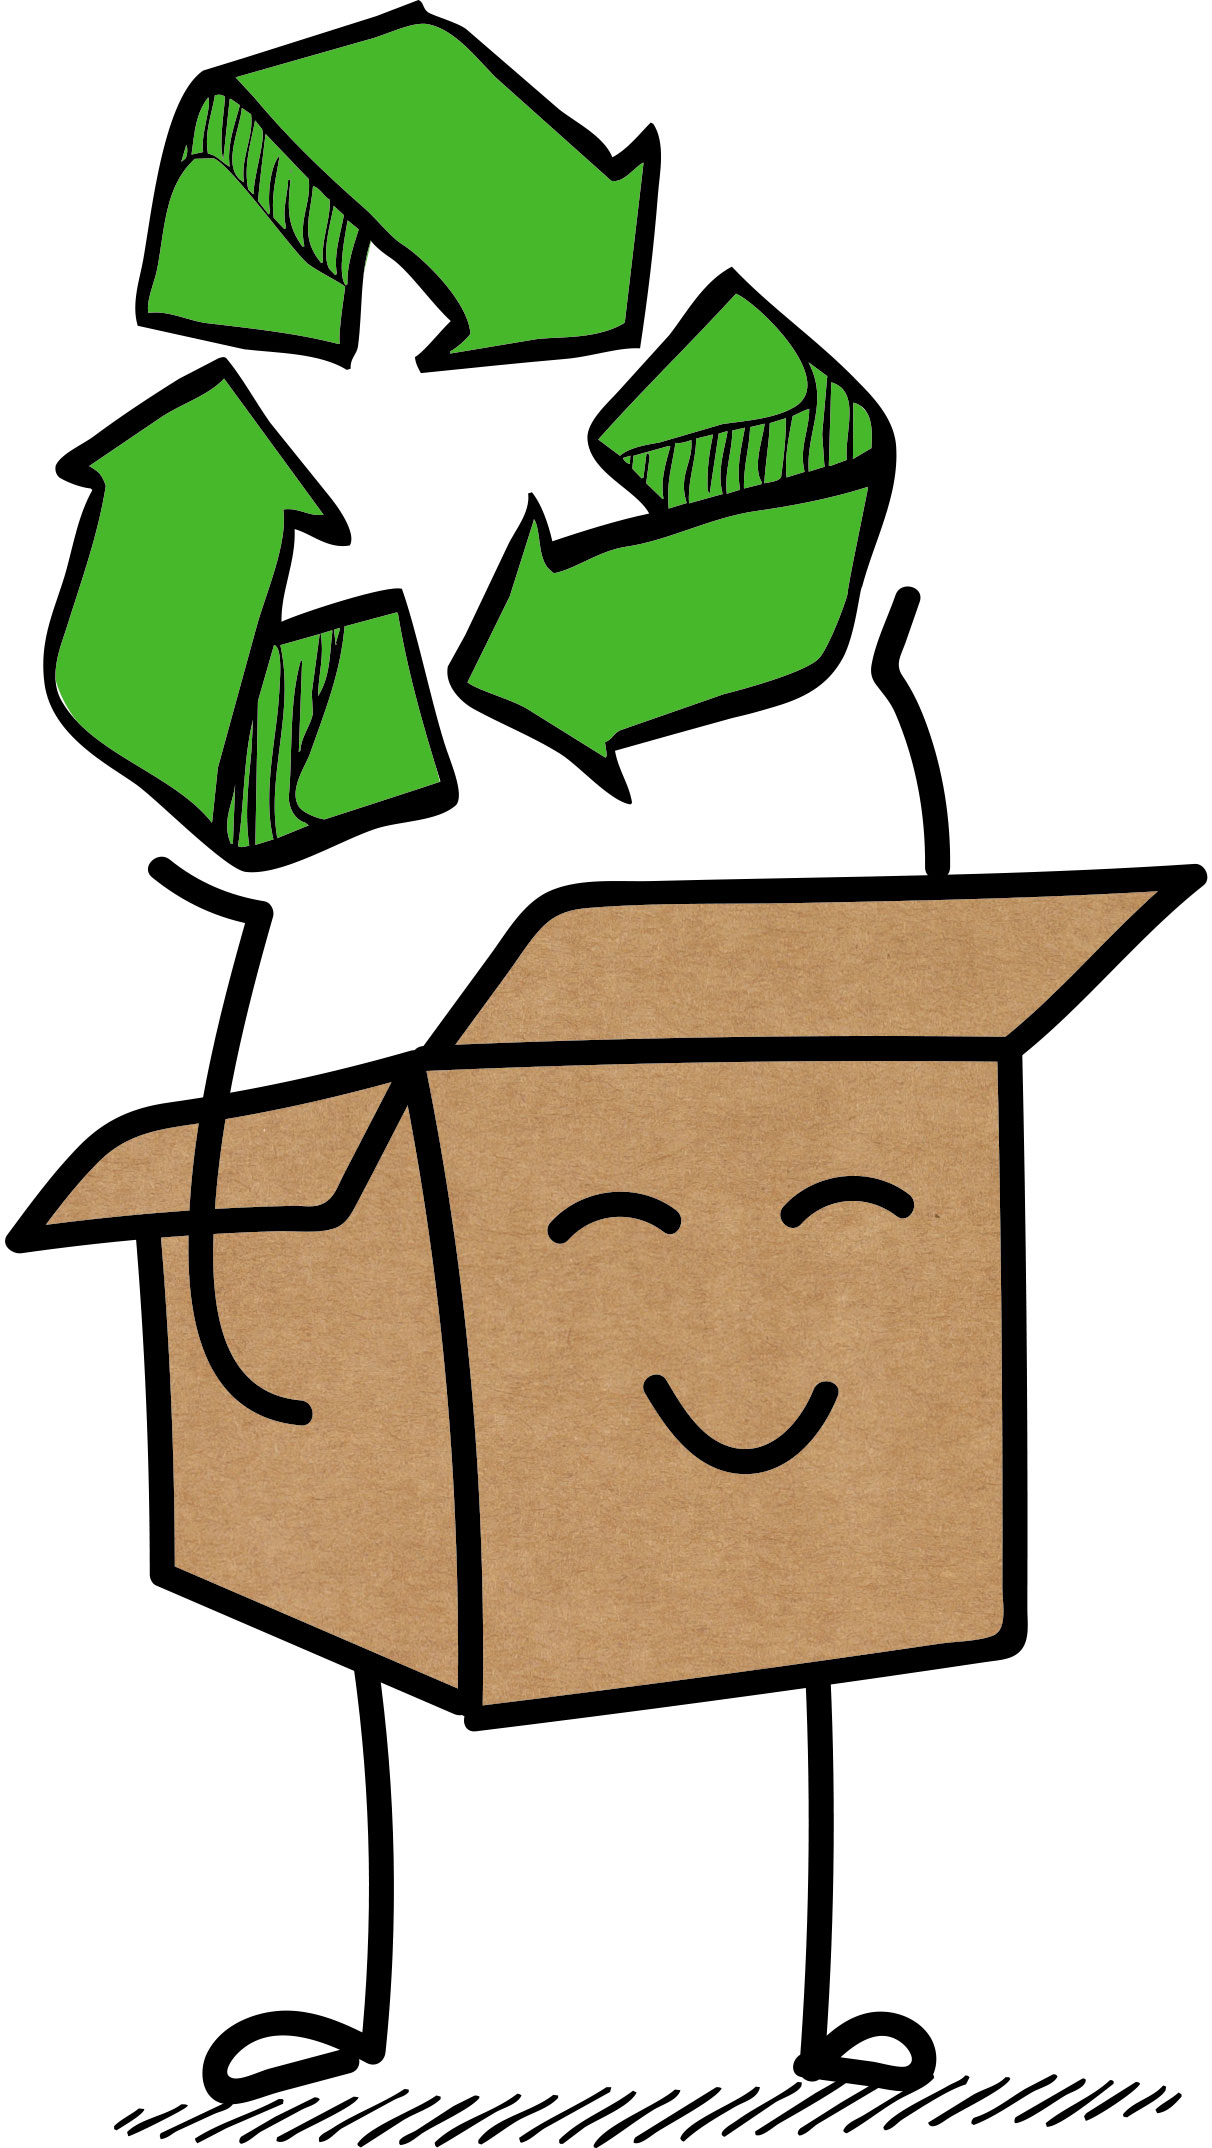 Grafik: Paket, als Männchen stilisiert, hält das Recycling-Symbol hoch